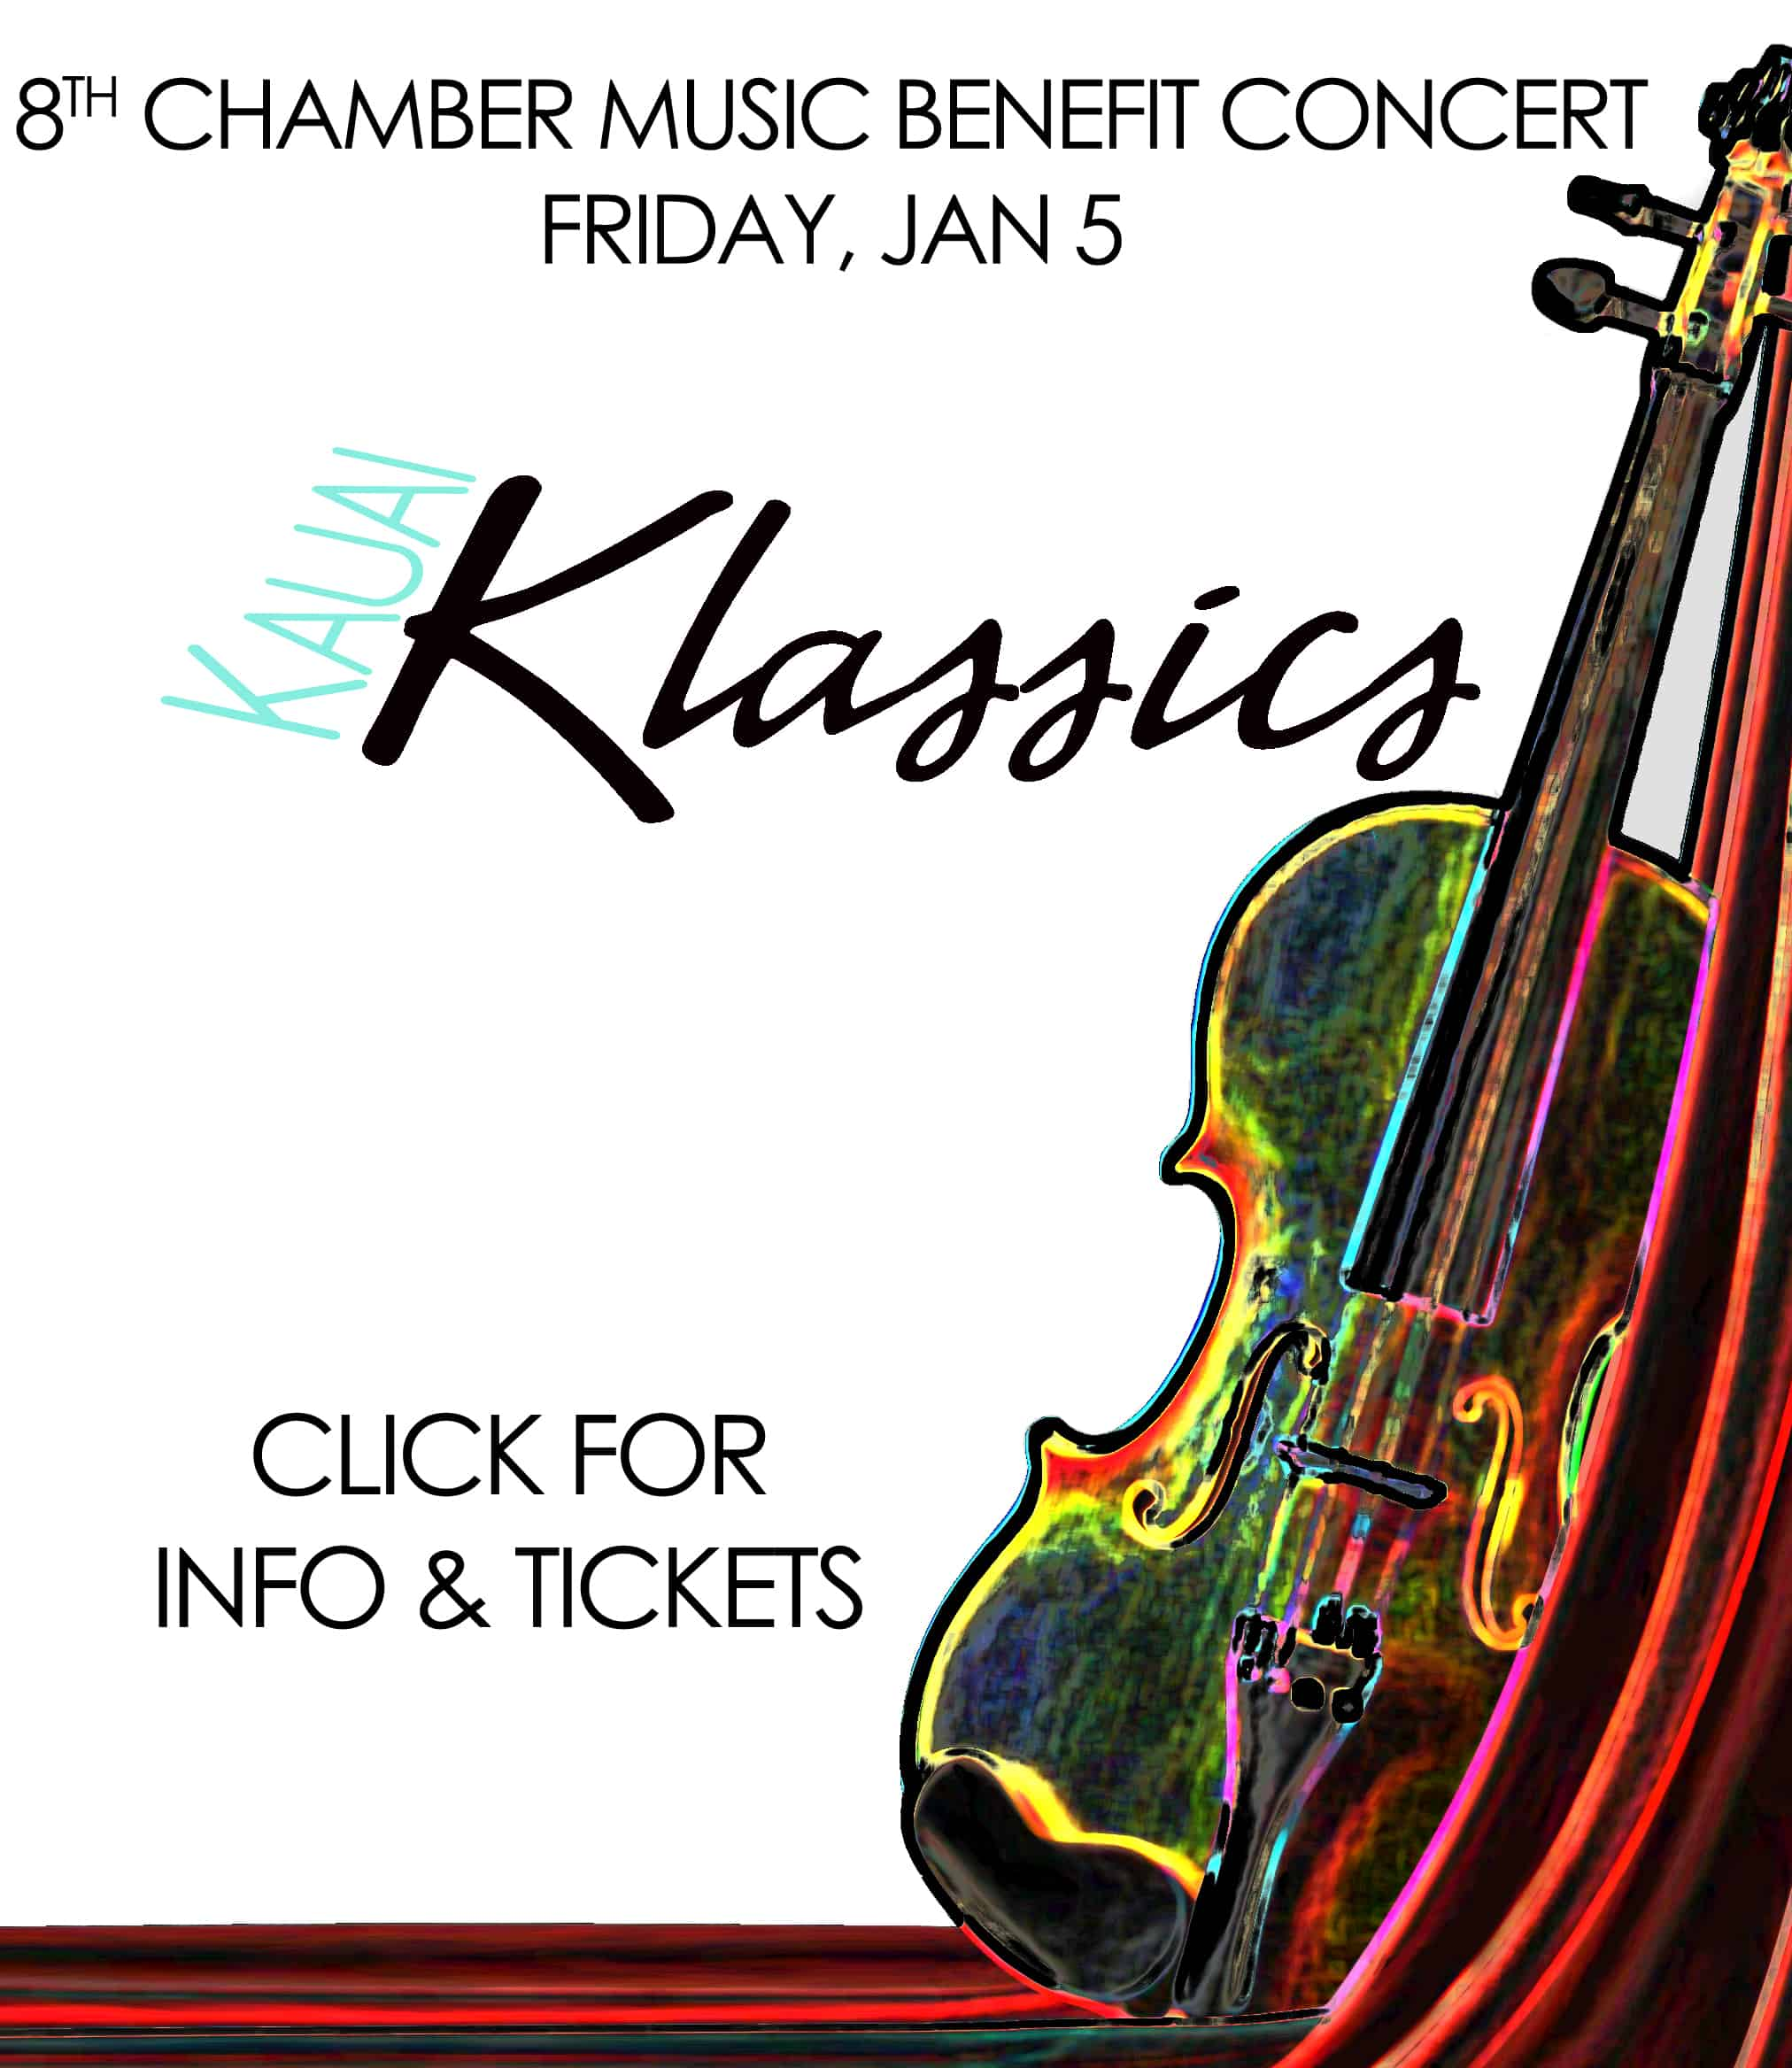 Kauai Klassics: 8th Chamber Music Benefit Concert